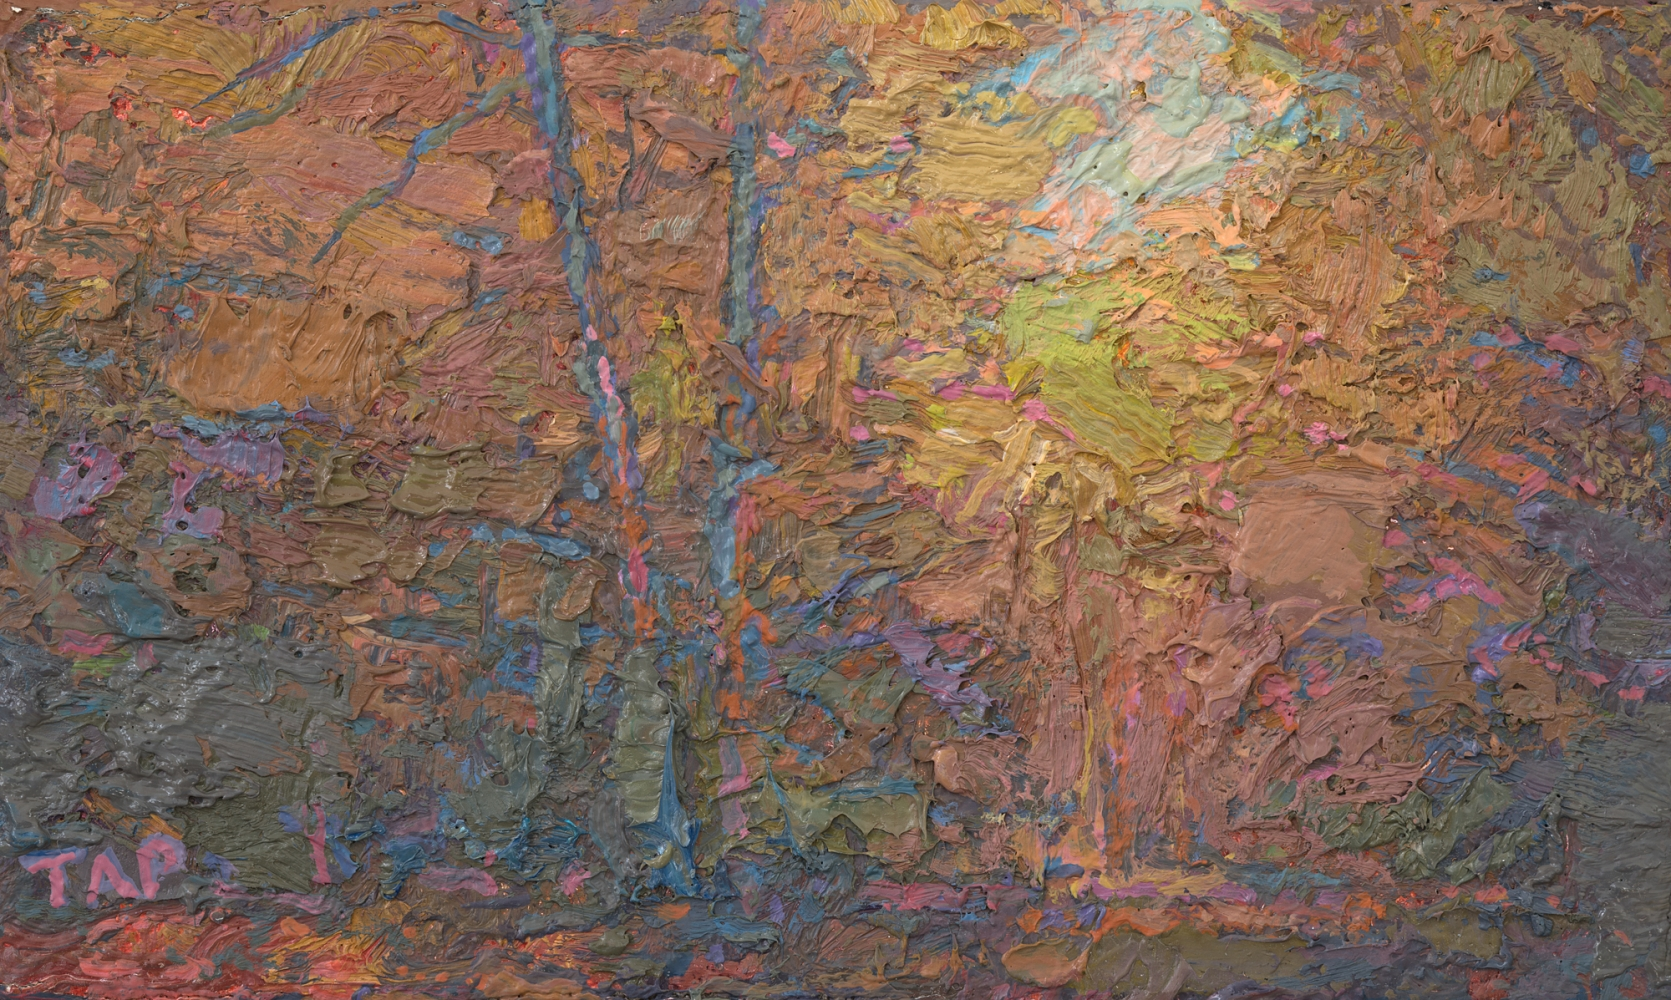 "Ironwood Trail Study III (Red Shift)  3.13"" x 5.13""  Oil/Linen/Mounted On Wood Panel"